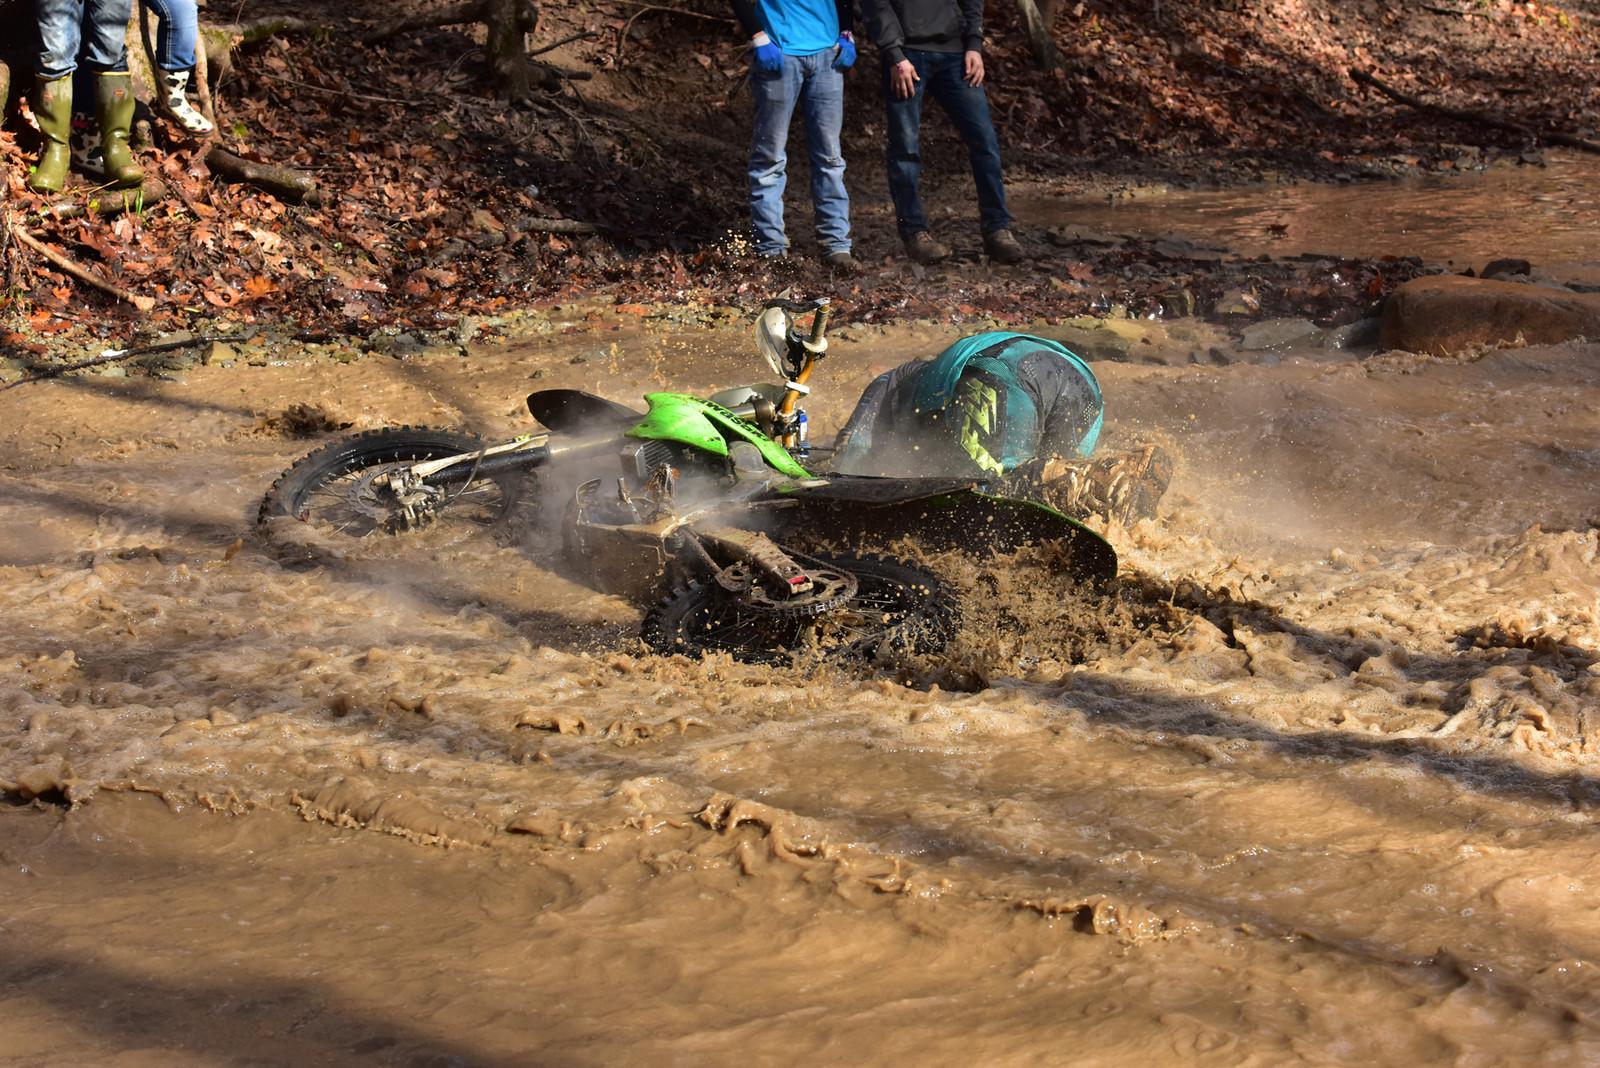 Creek crossing - Photo Blast: Ironman GNCC - Motocross Pictures - Vital MX